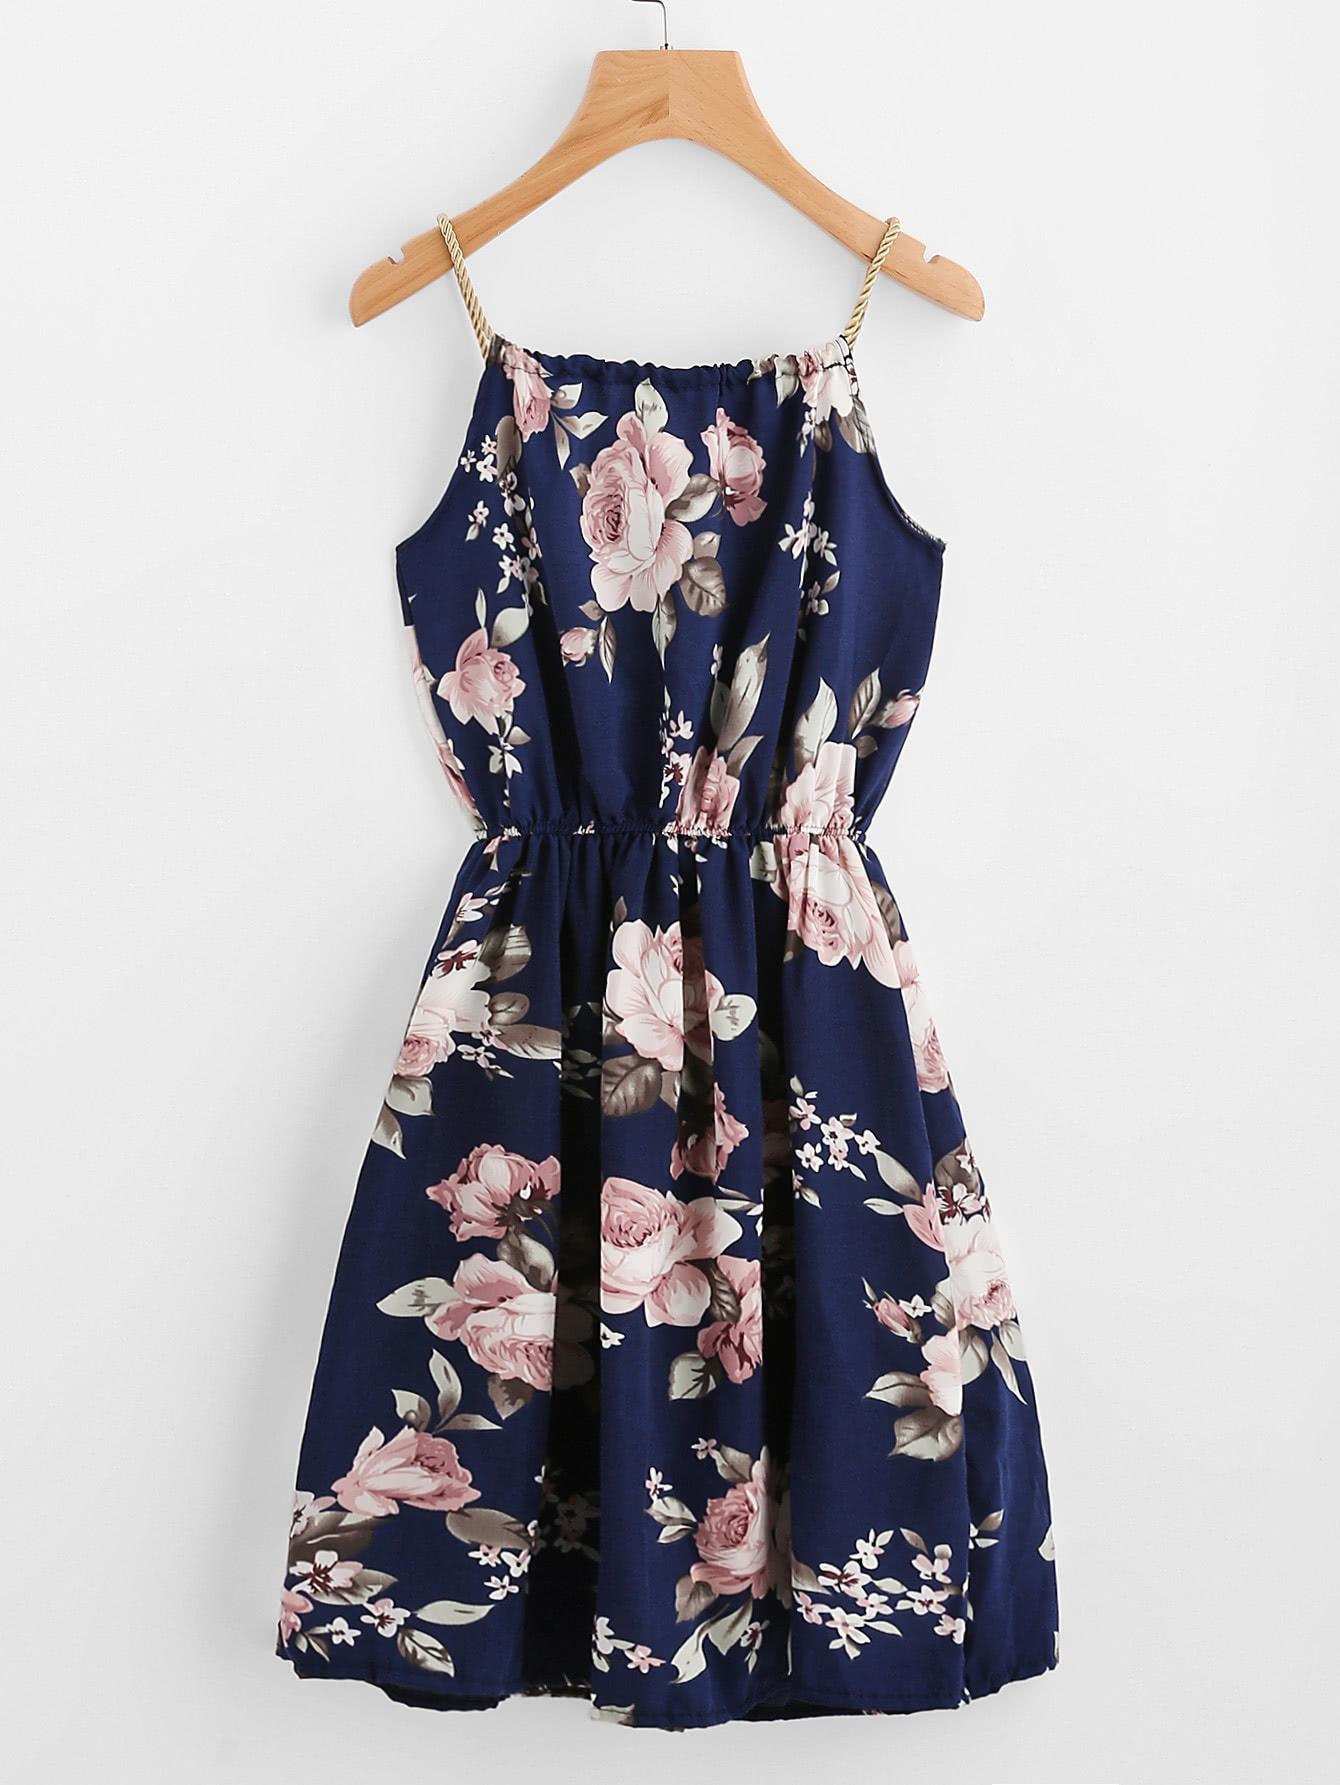 Braided Bead Strap Tie Floral Print Dress